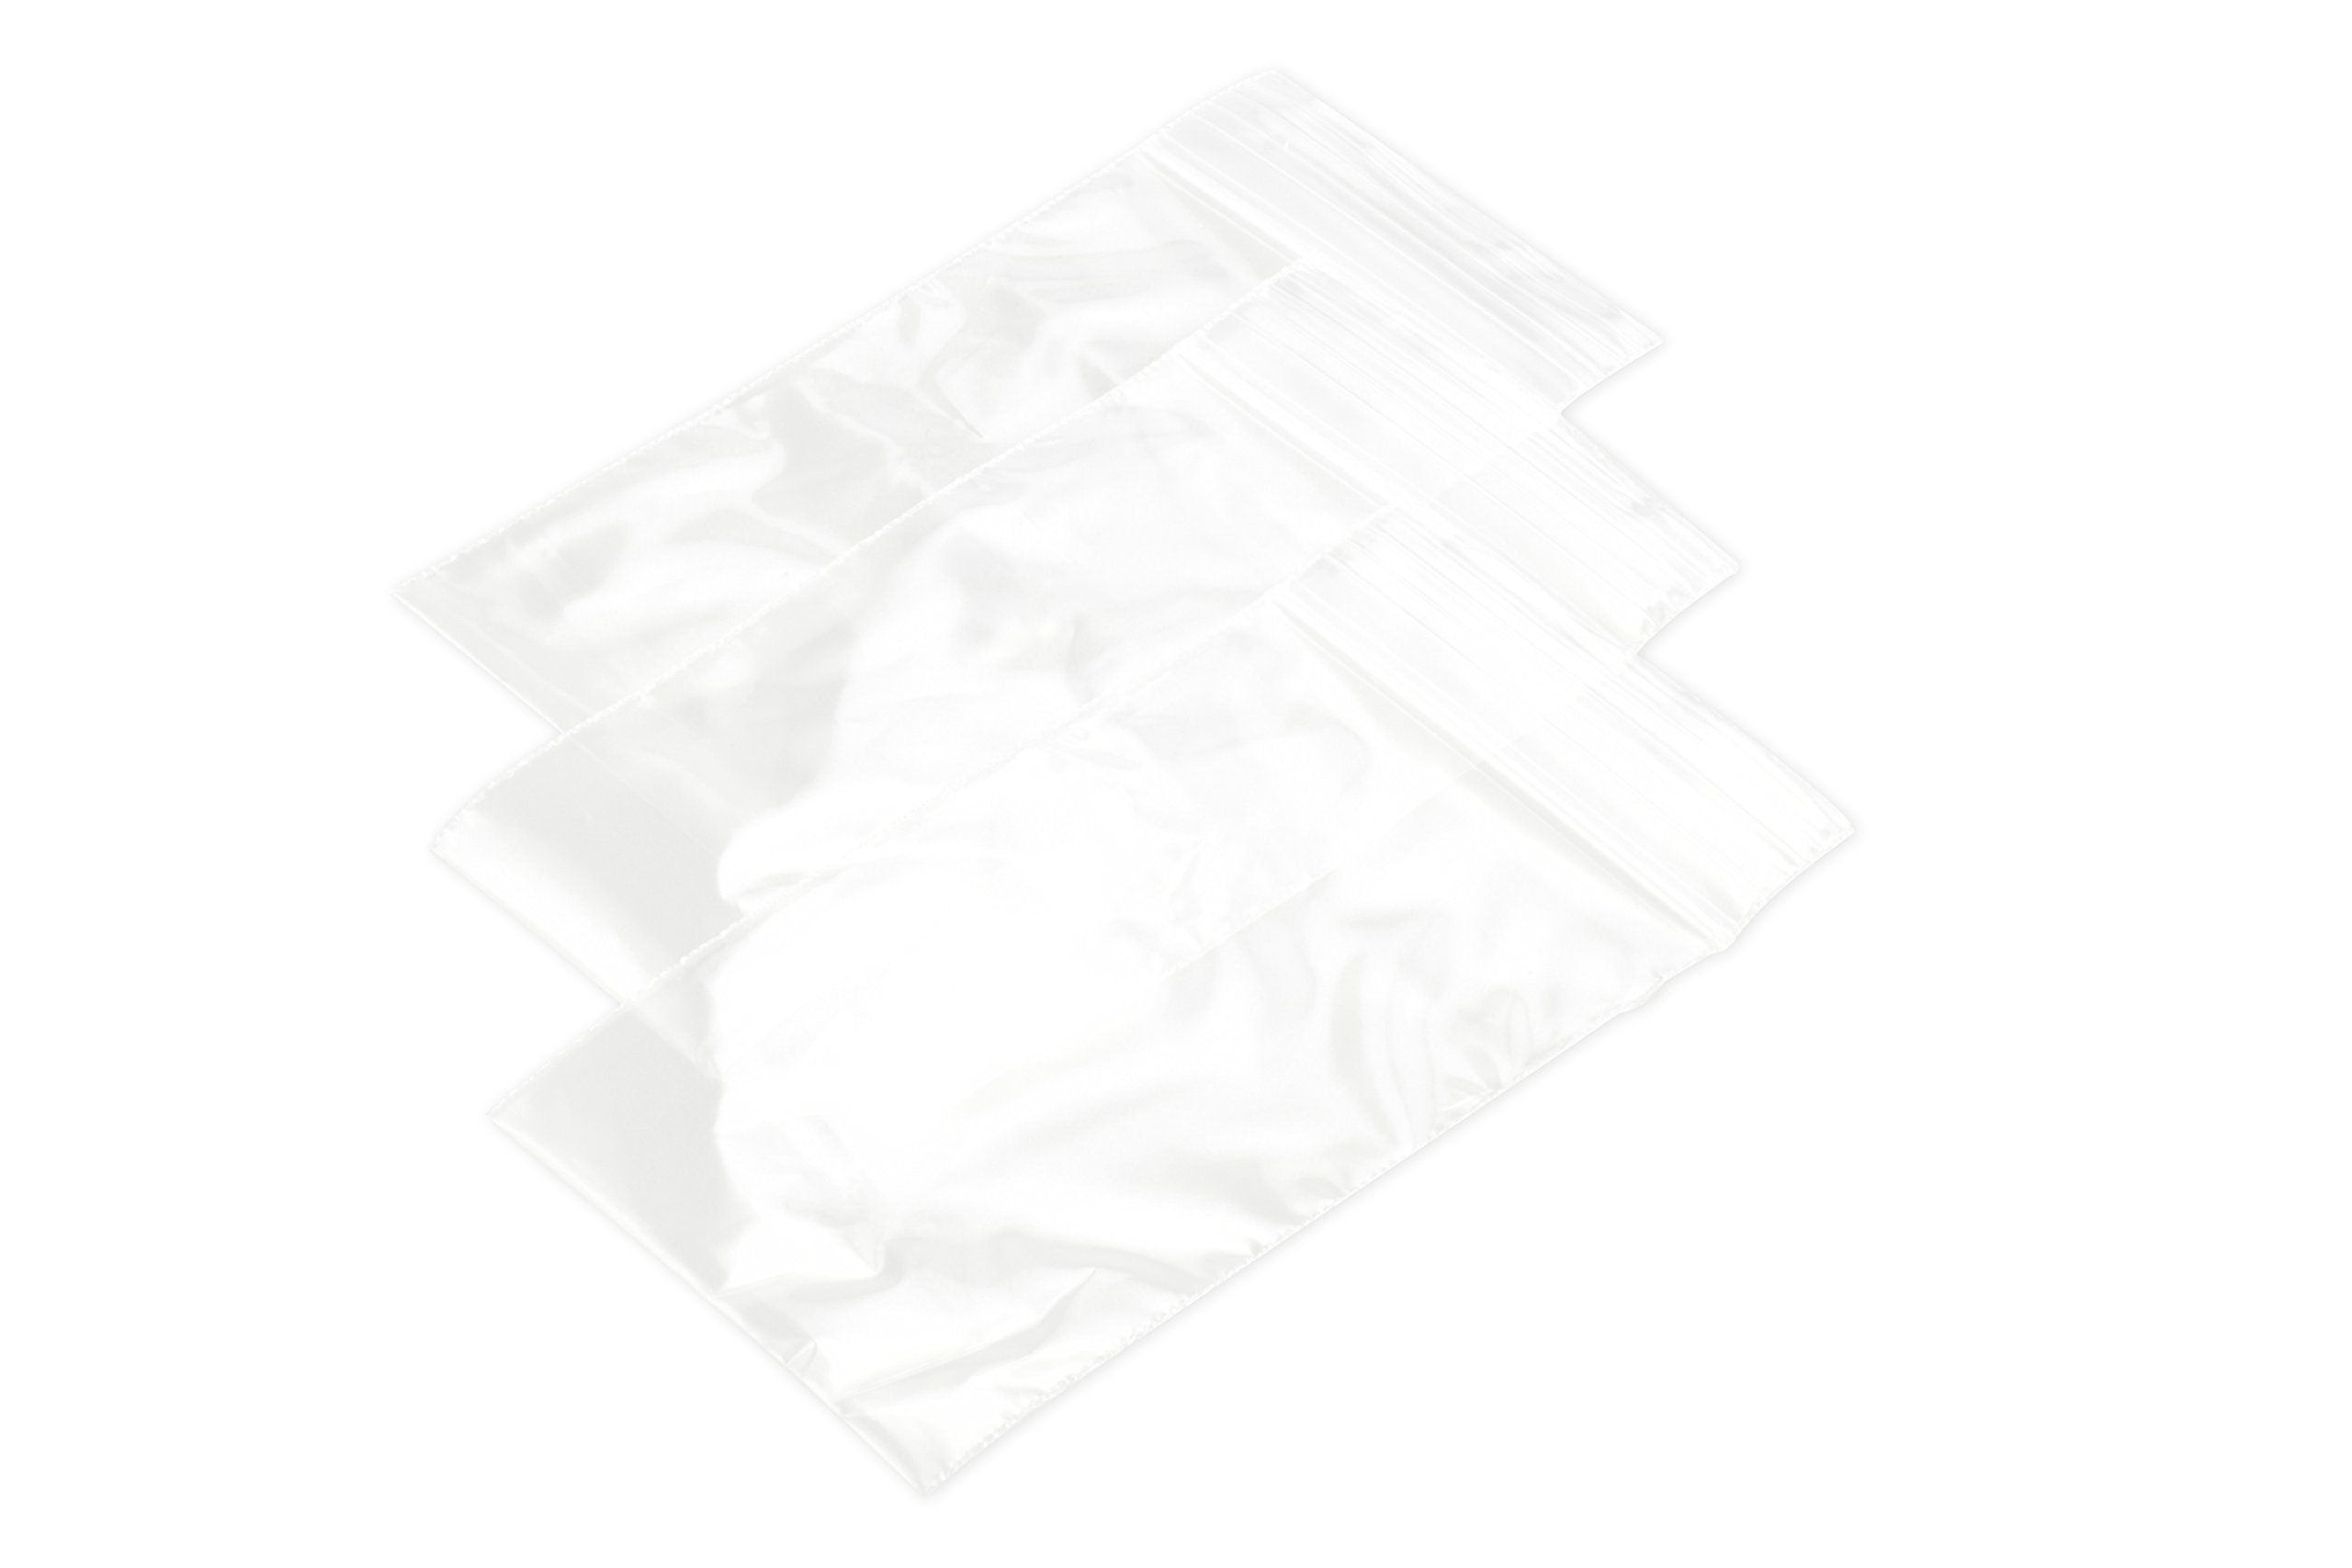 "SE 2"" x 3"" Self-Locking Bags (1000 Count) - ZB23-1K"